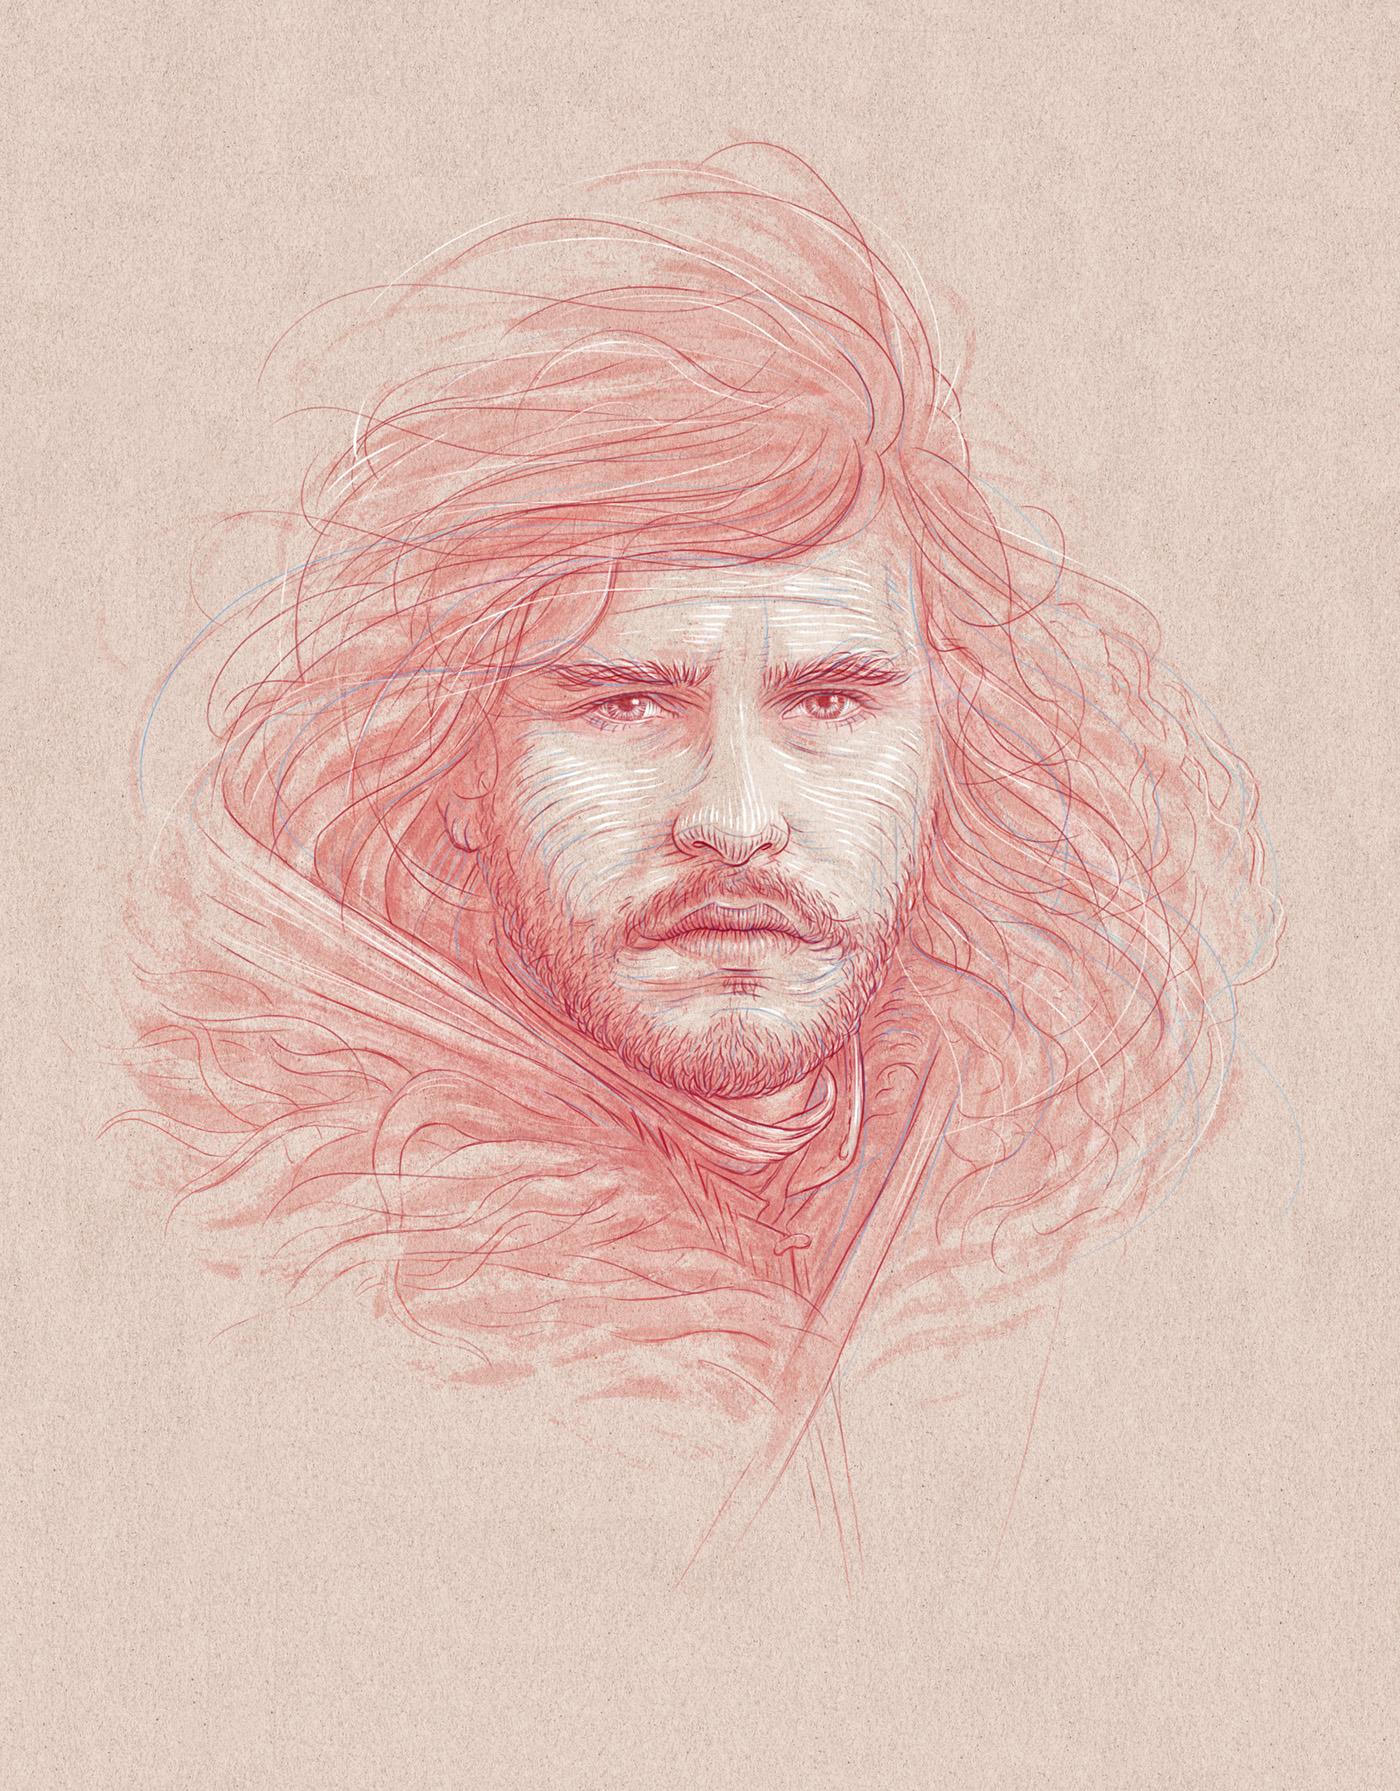 Game Of Thrones Fan Art (1)